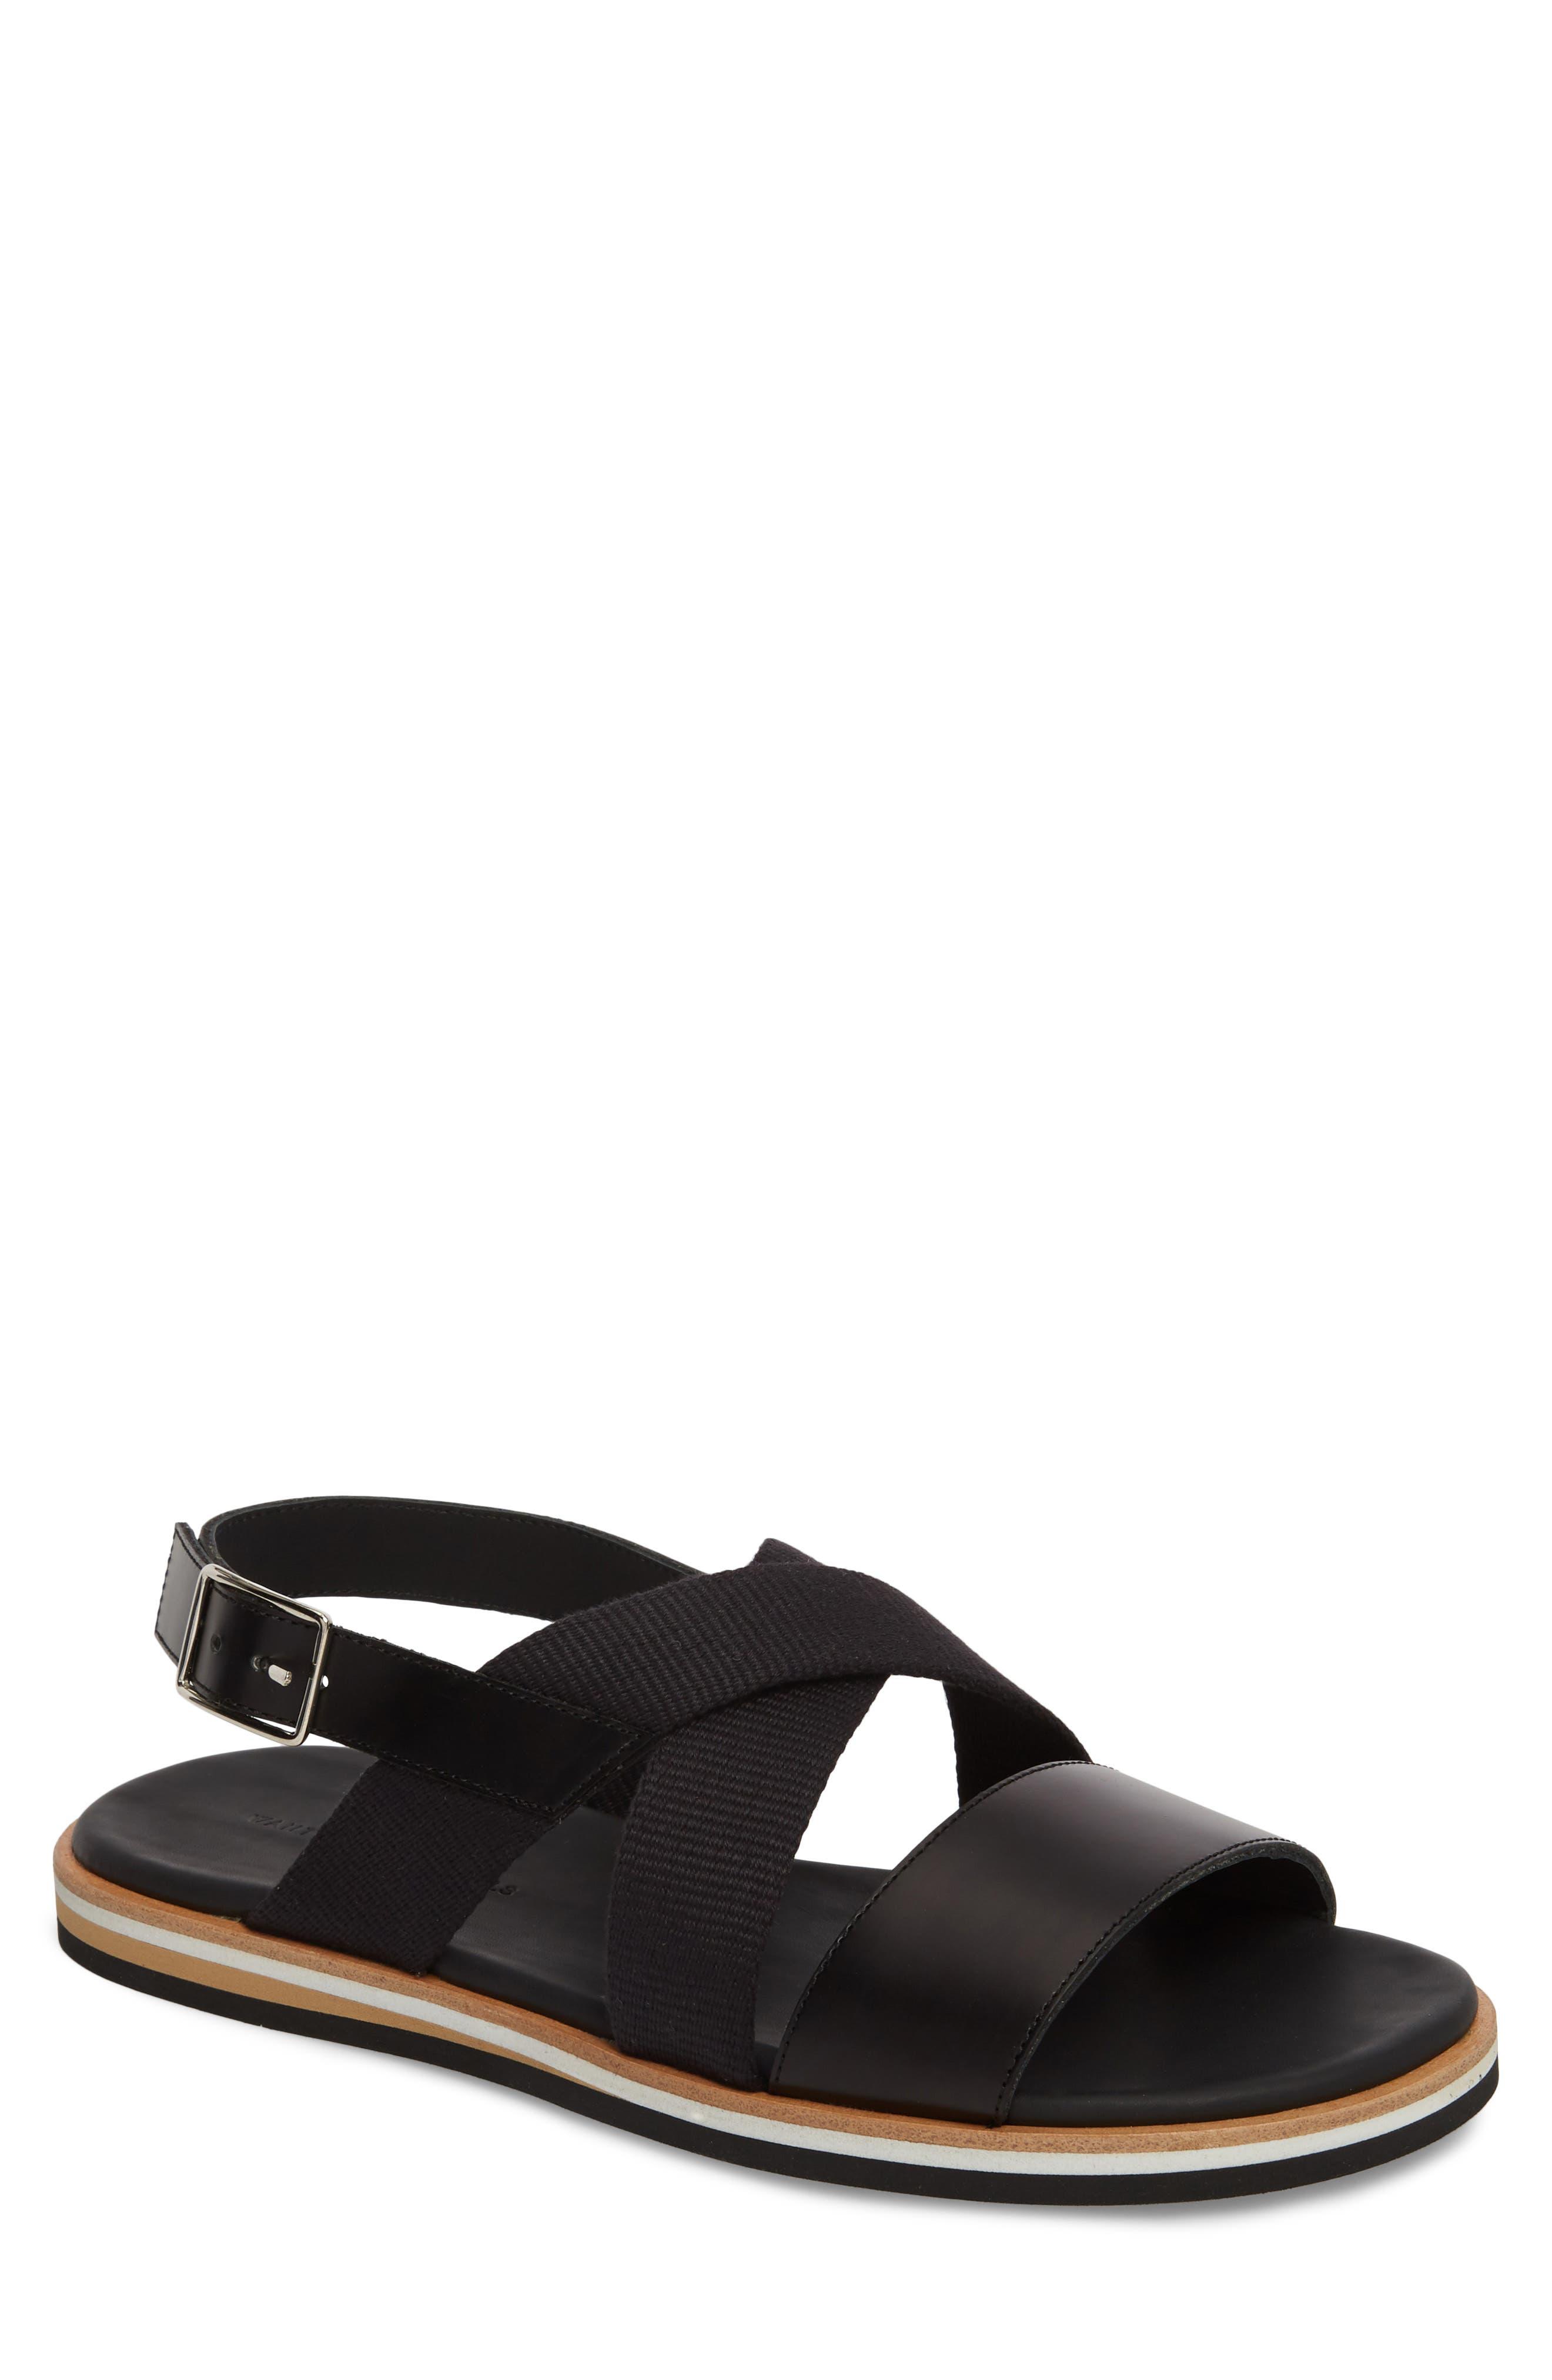 Jobim Sandal,                         Main,                         color,